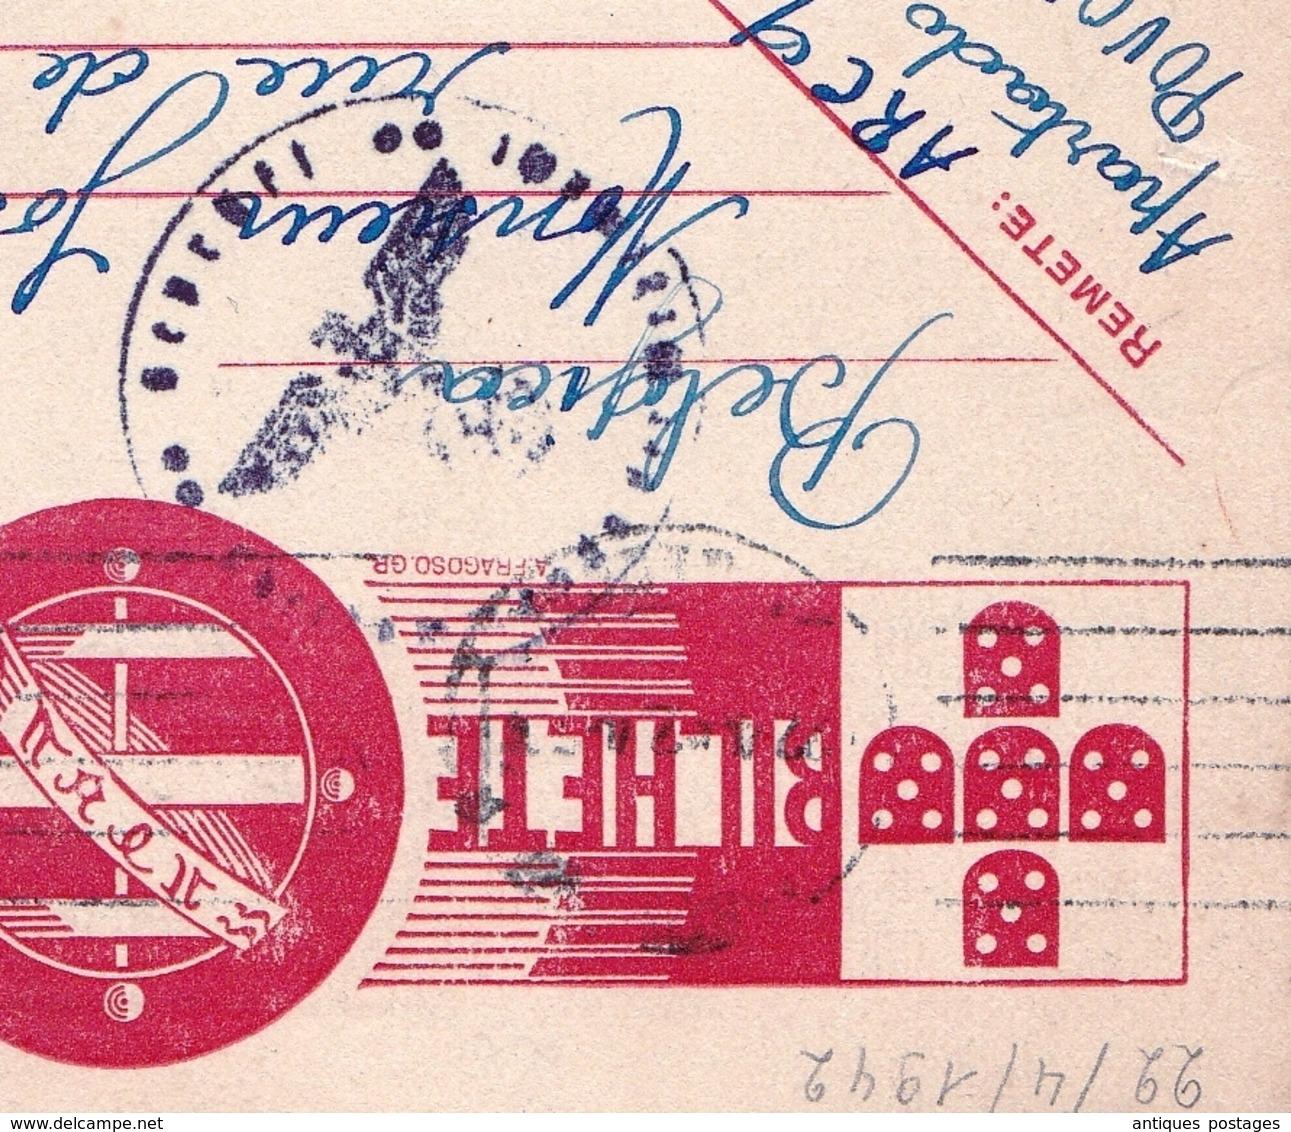 Carte Postale Póvoa De Santa Iria Portugal 1942 Censure Censor Seconde Guerre Mondiale WW2 - Lettres & Documents